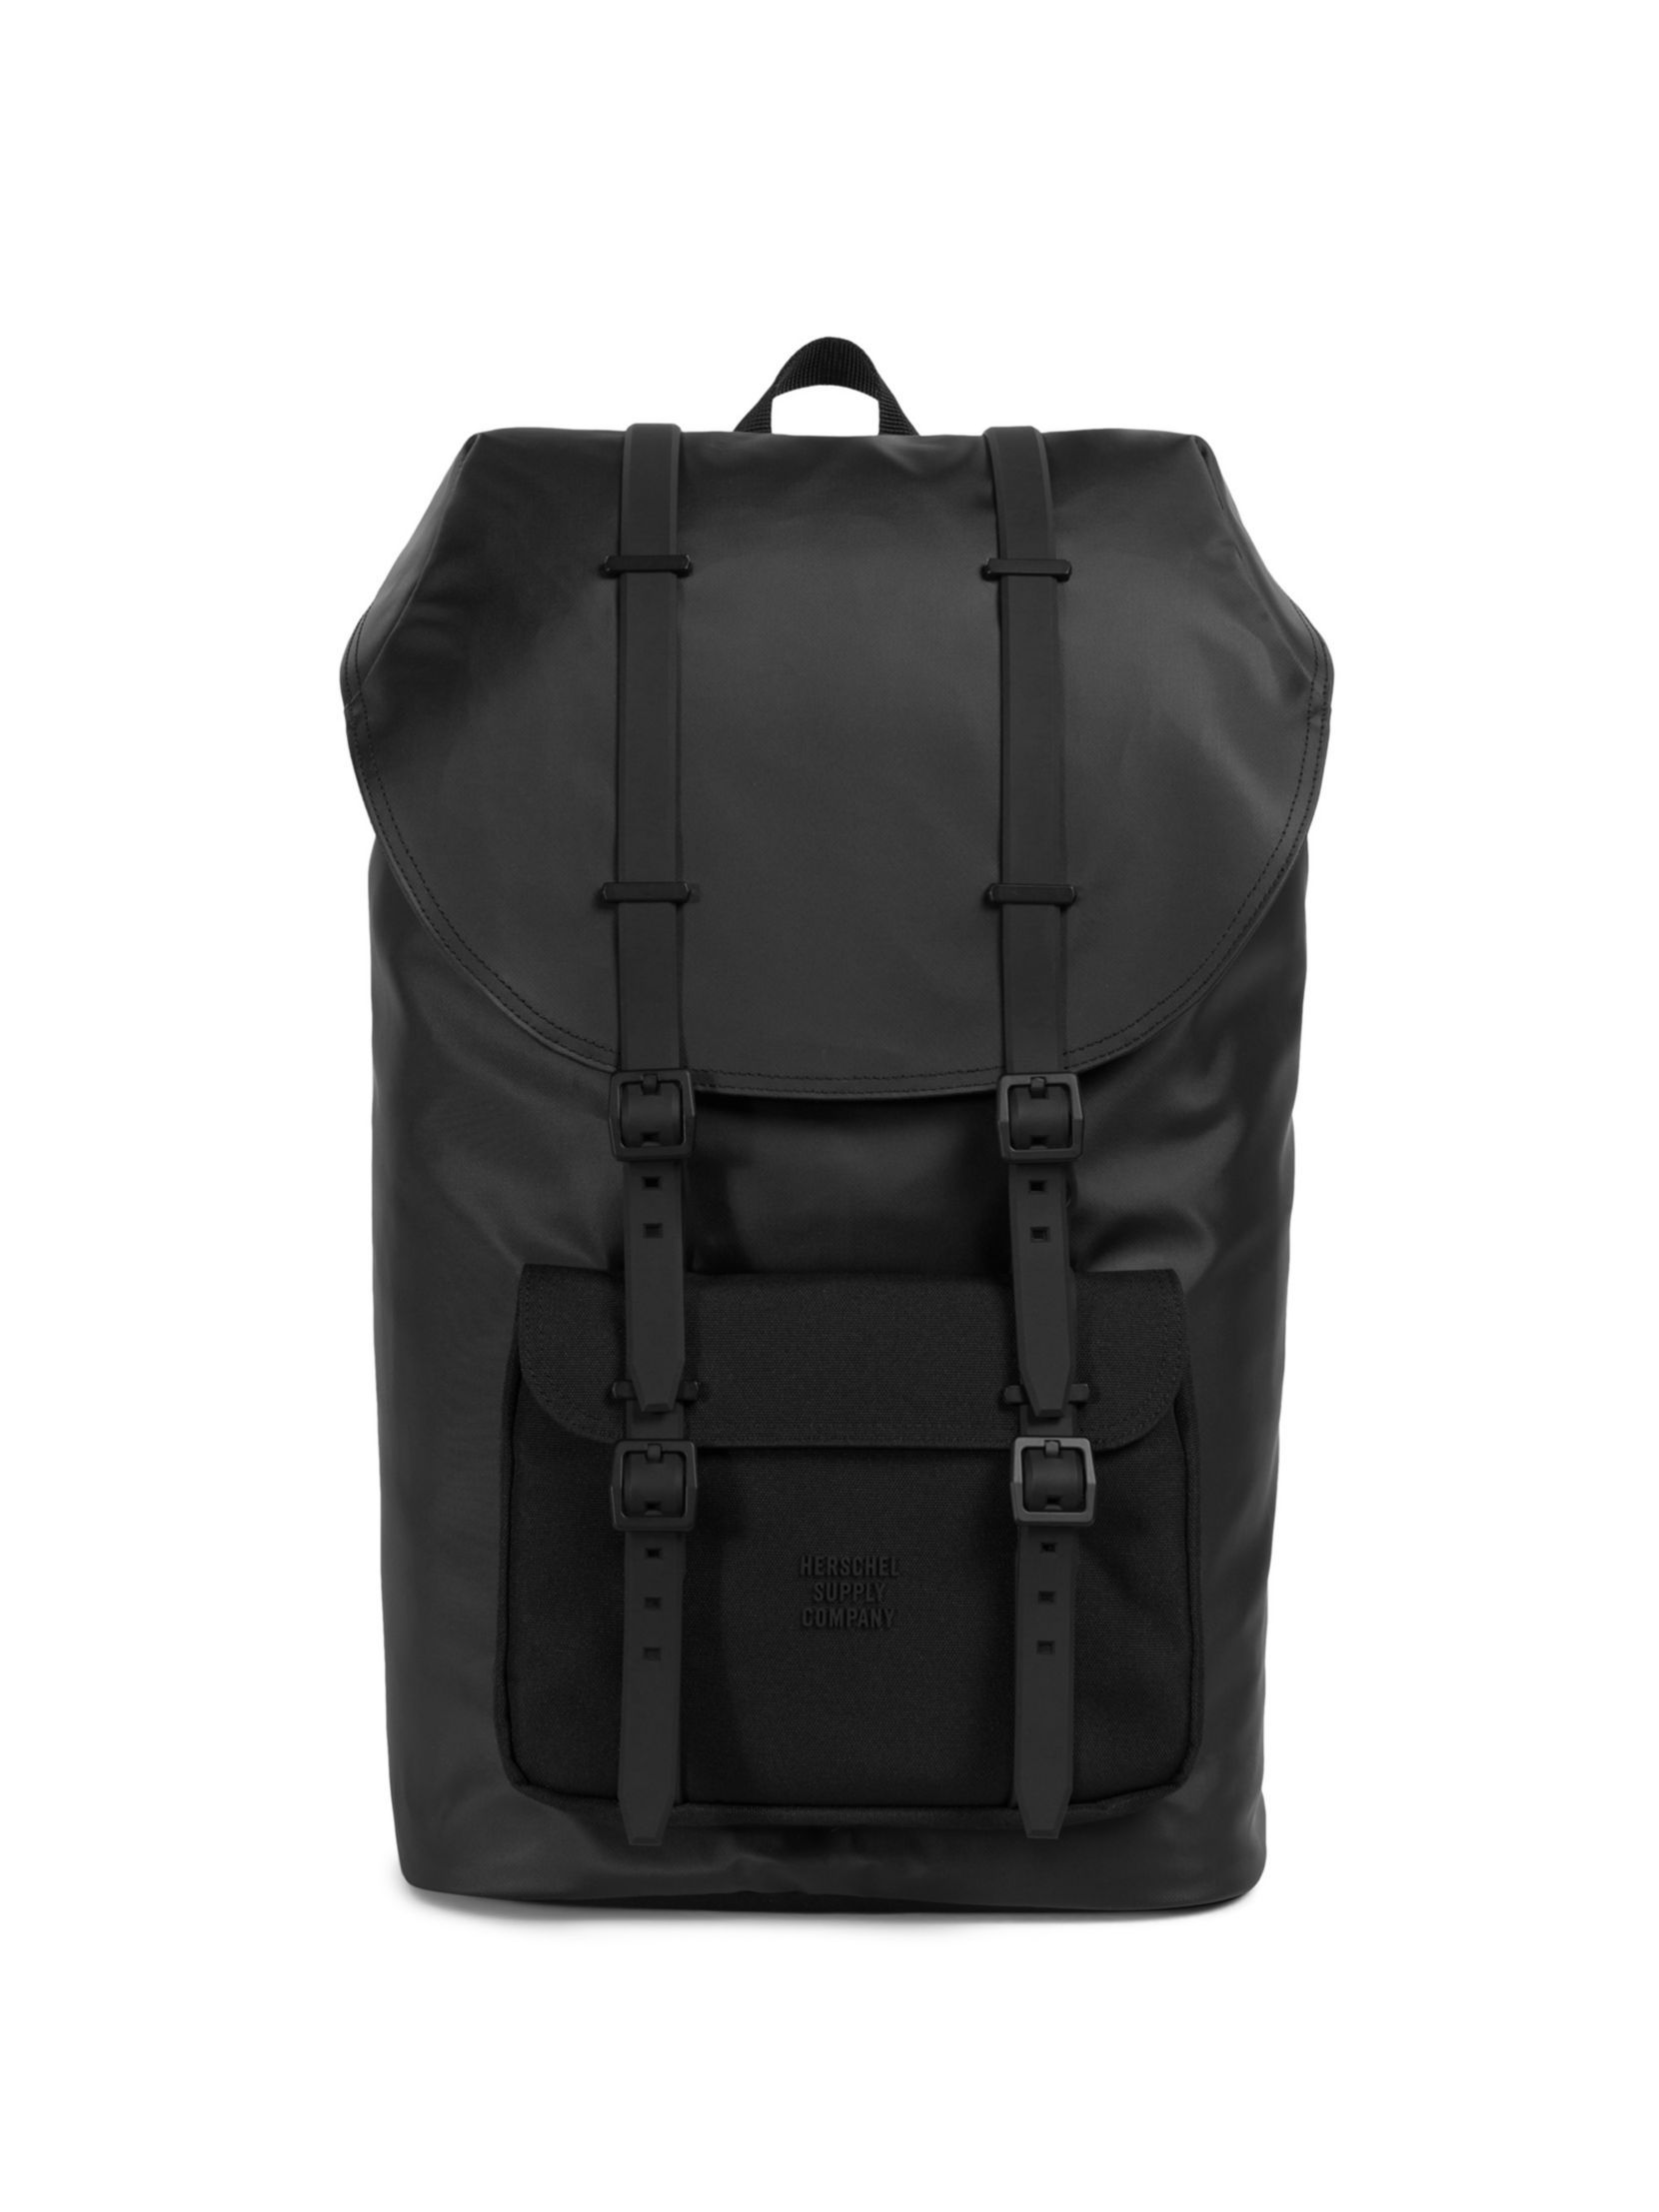 Herschel Supply Co. Little America Canvas Backpack   Bags   Pinterest c91330cb77